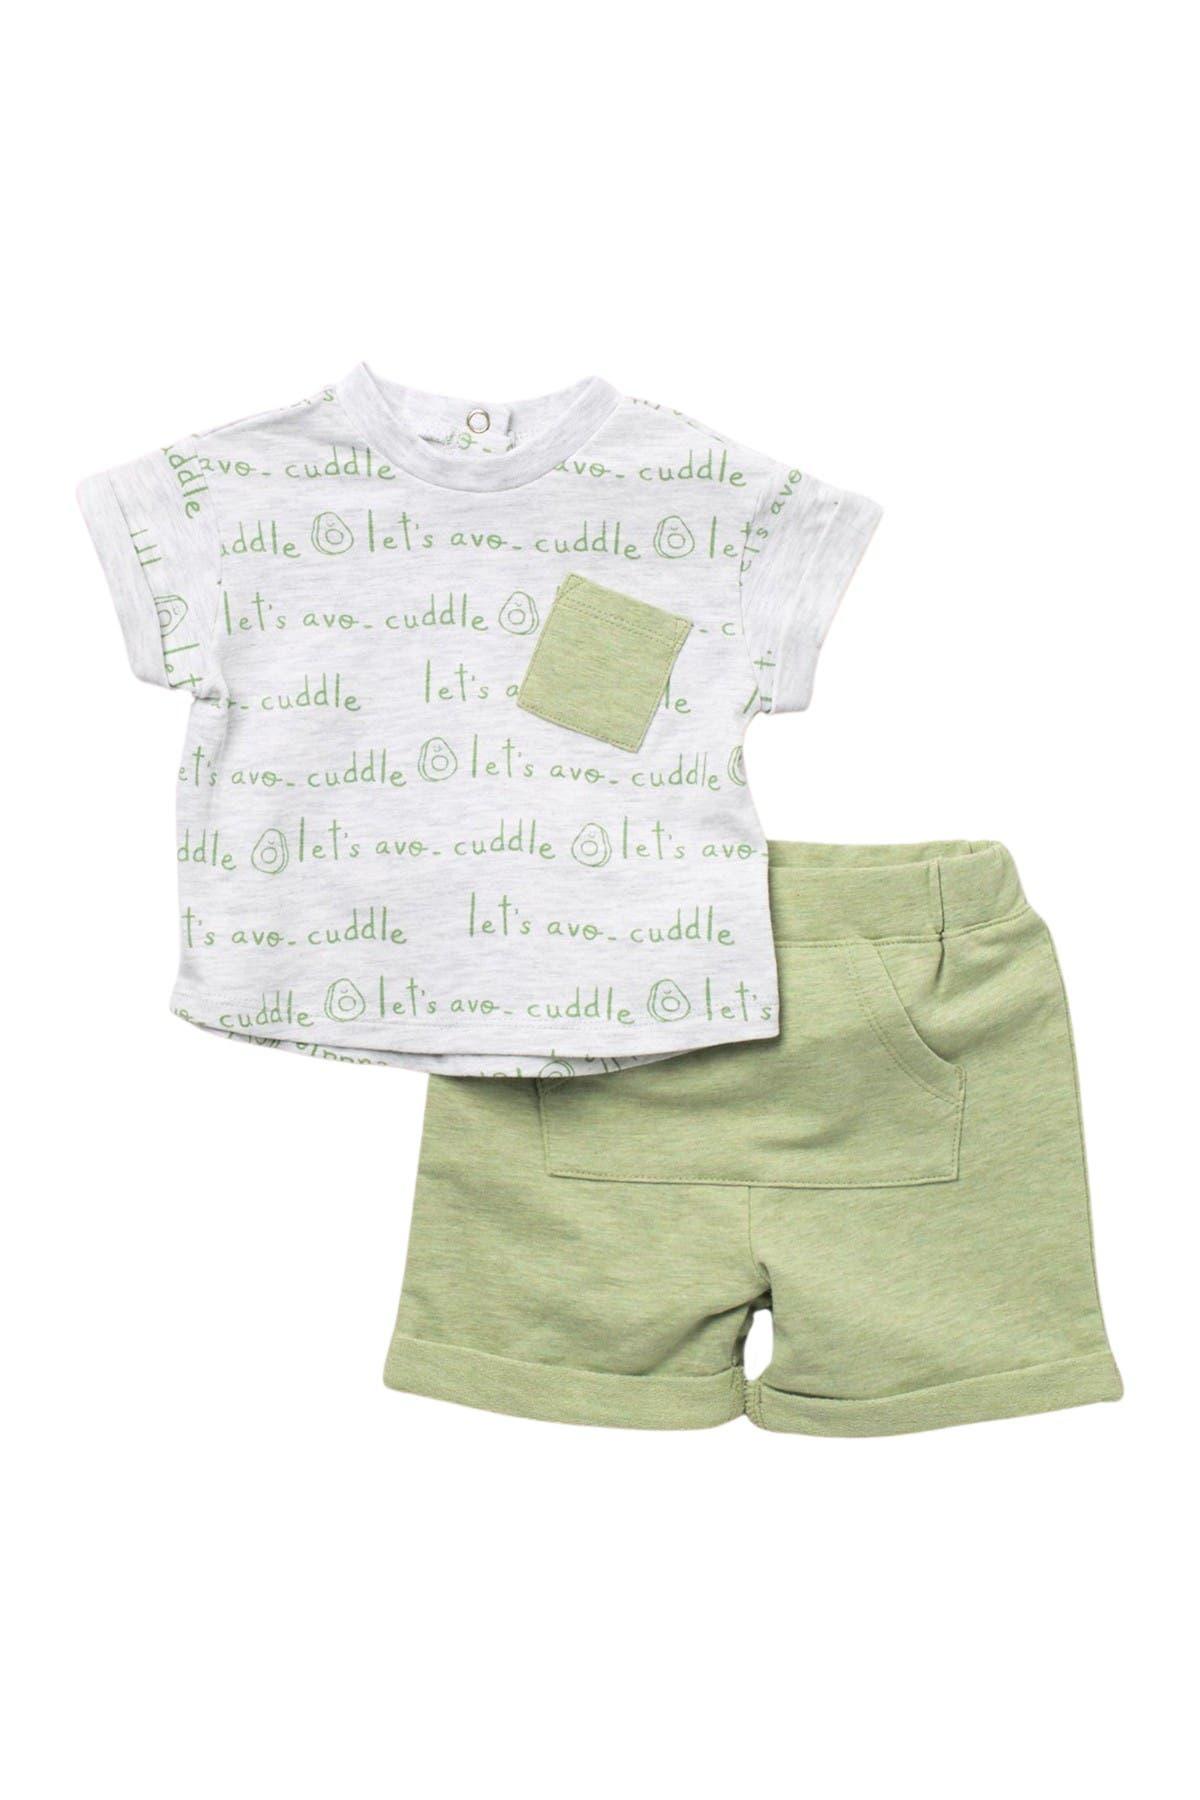 Image of FOCUS Avocado T-Shirt & Shorts 2-Piece Set